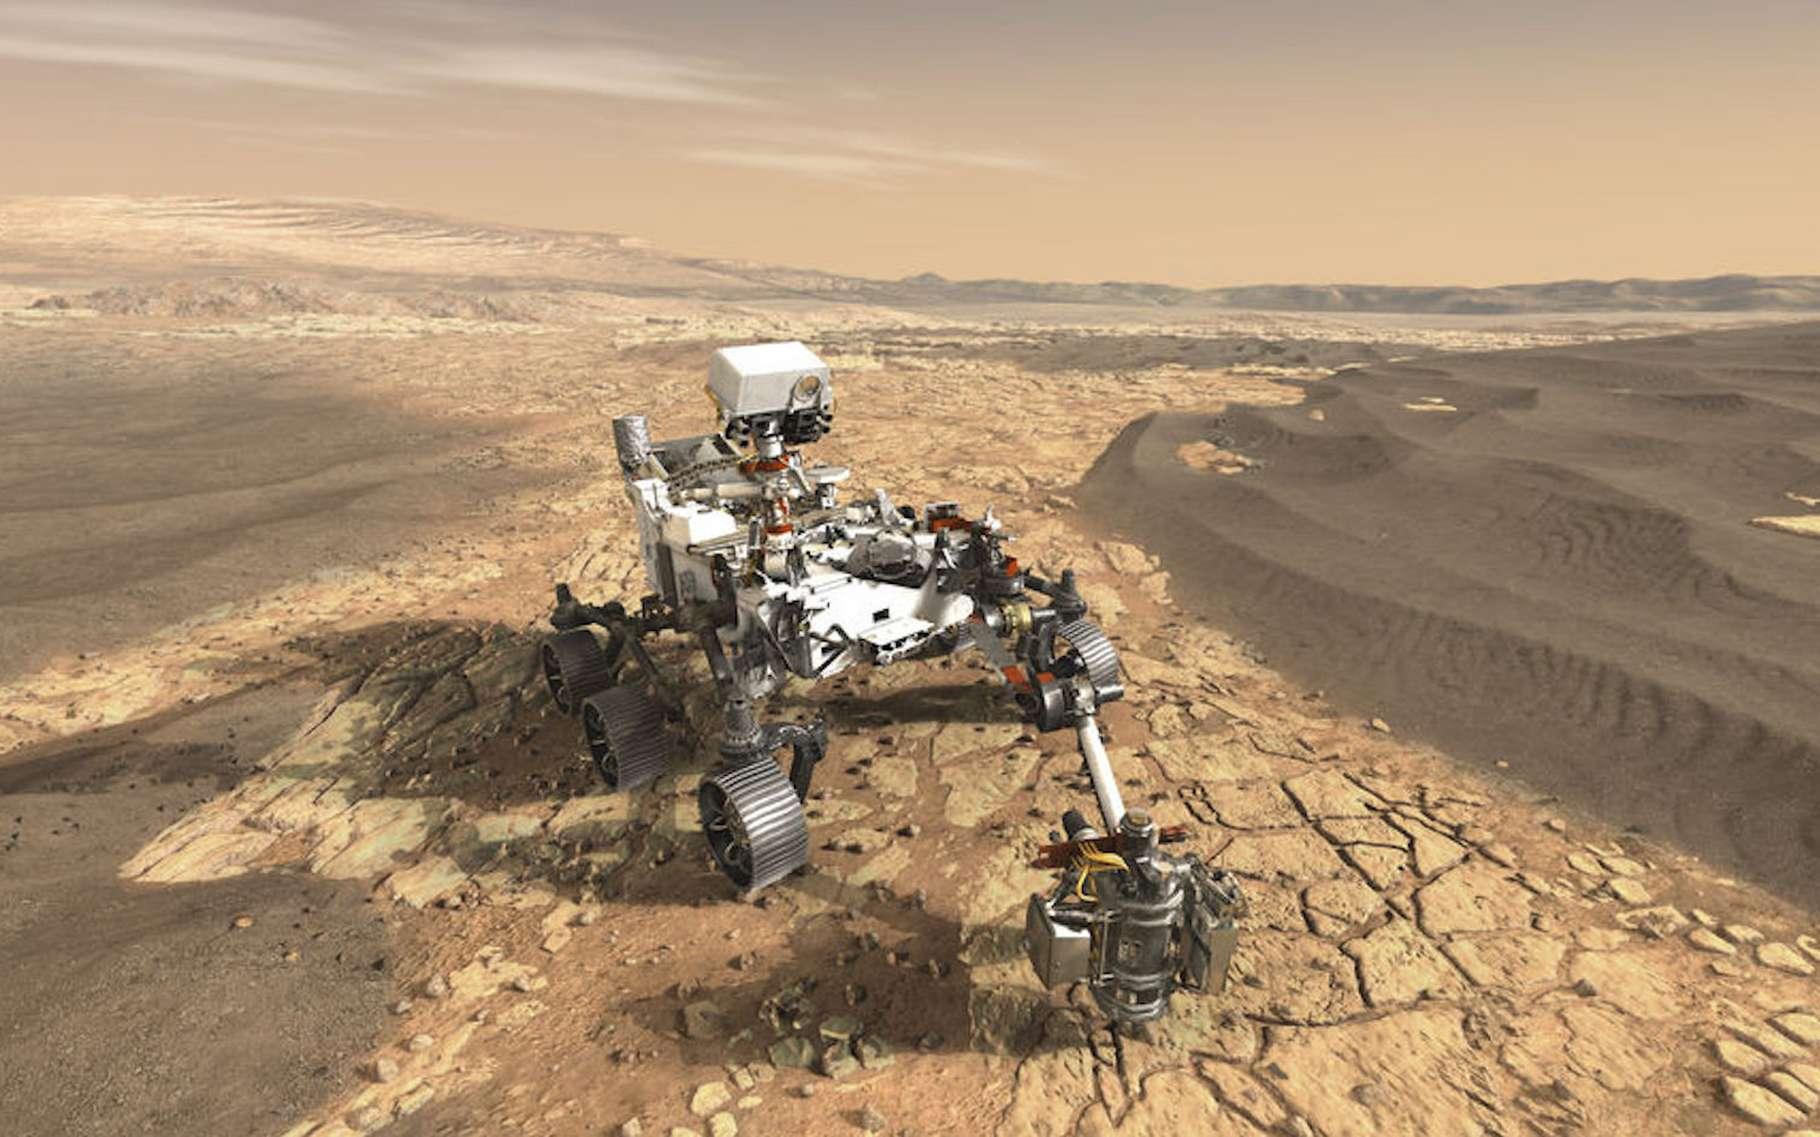 Le rover Perseverance de la Nasa a atterri sur Mars le 18 février 2021. © Nasa/JPL-Caltech